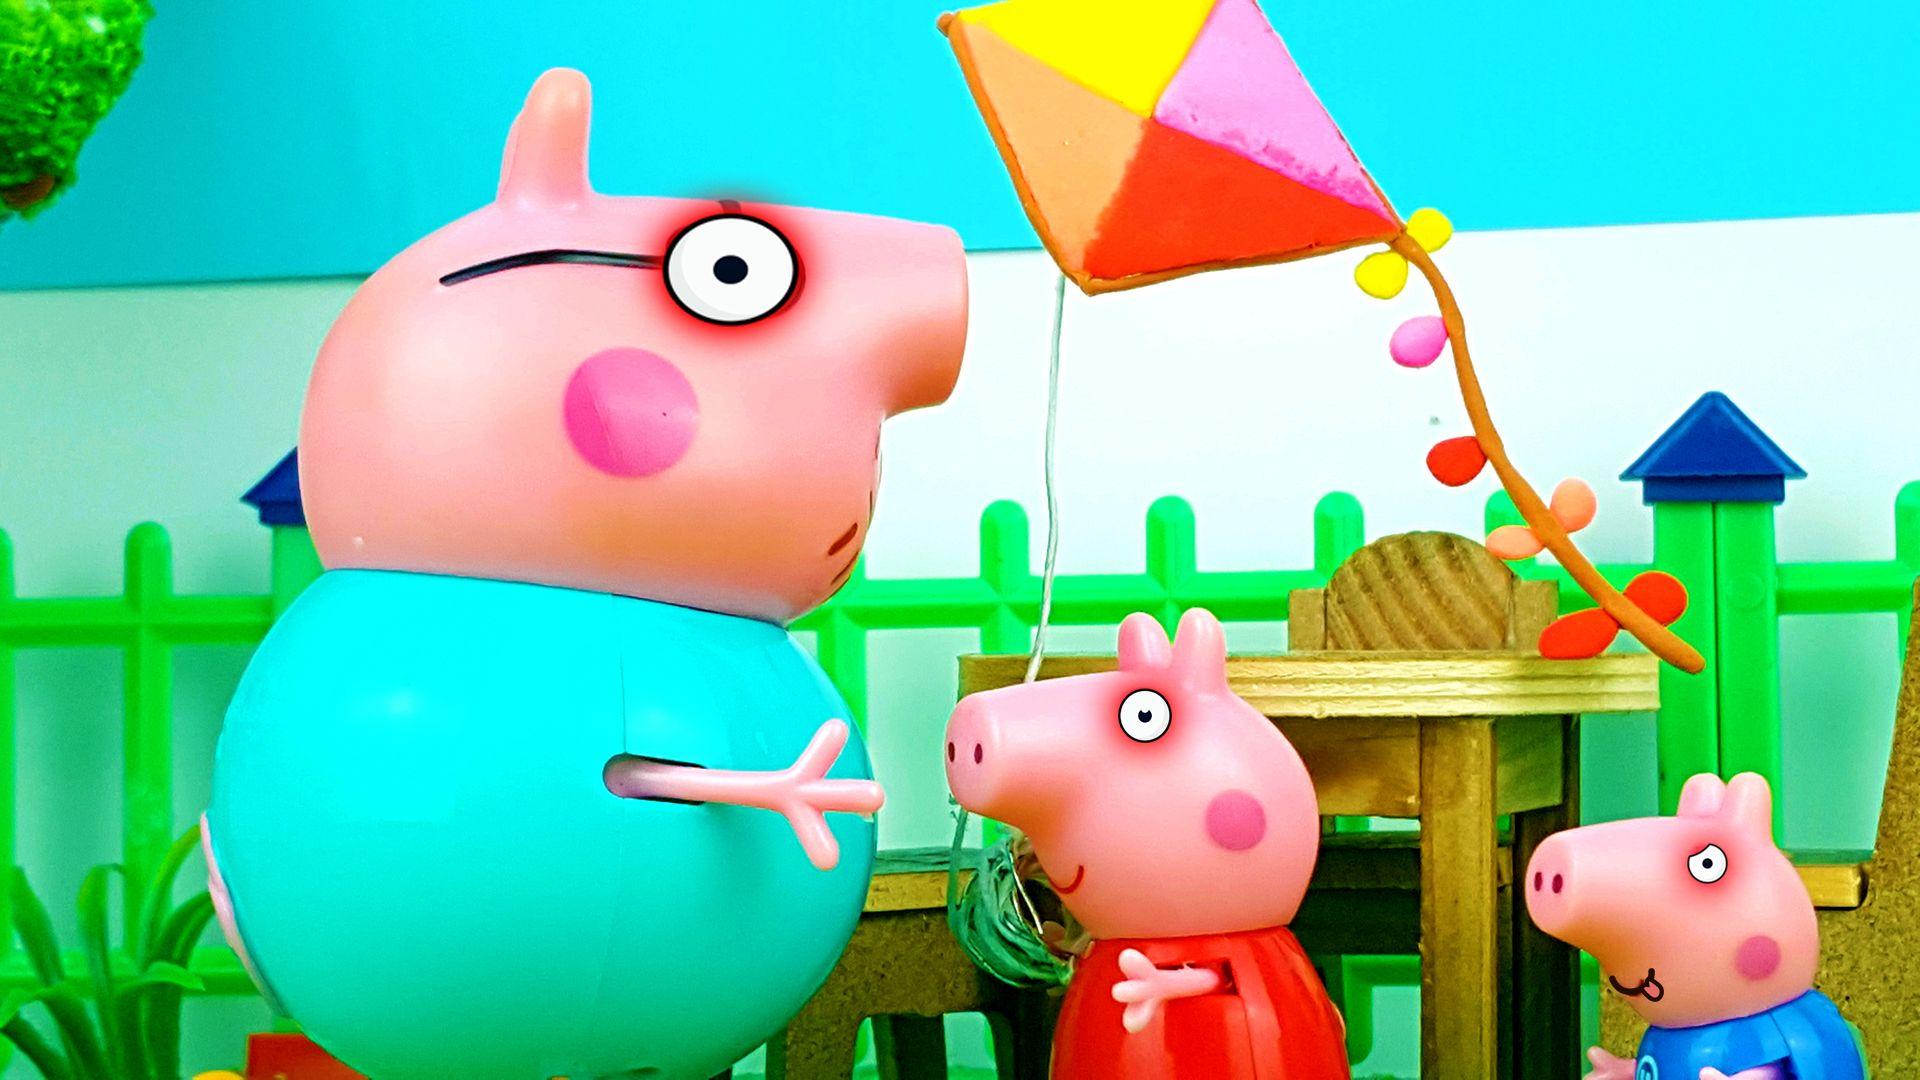 Play fly a kite - Cartoon for Kids - Peppa Pig English